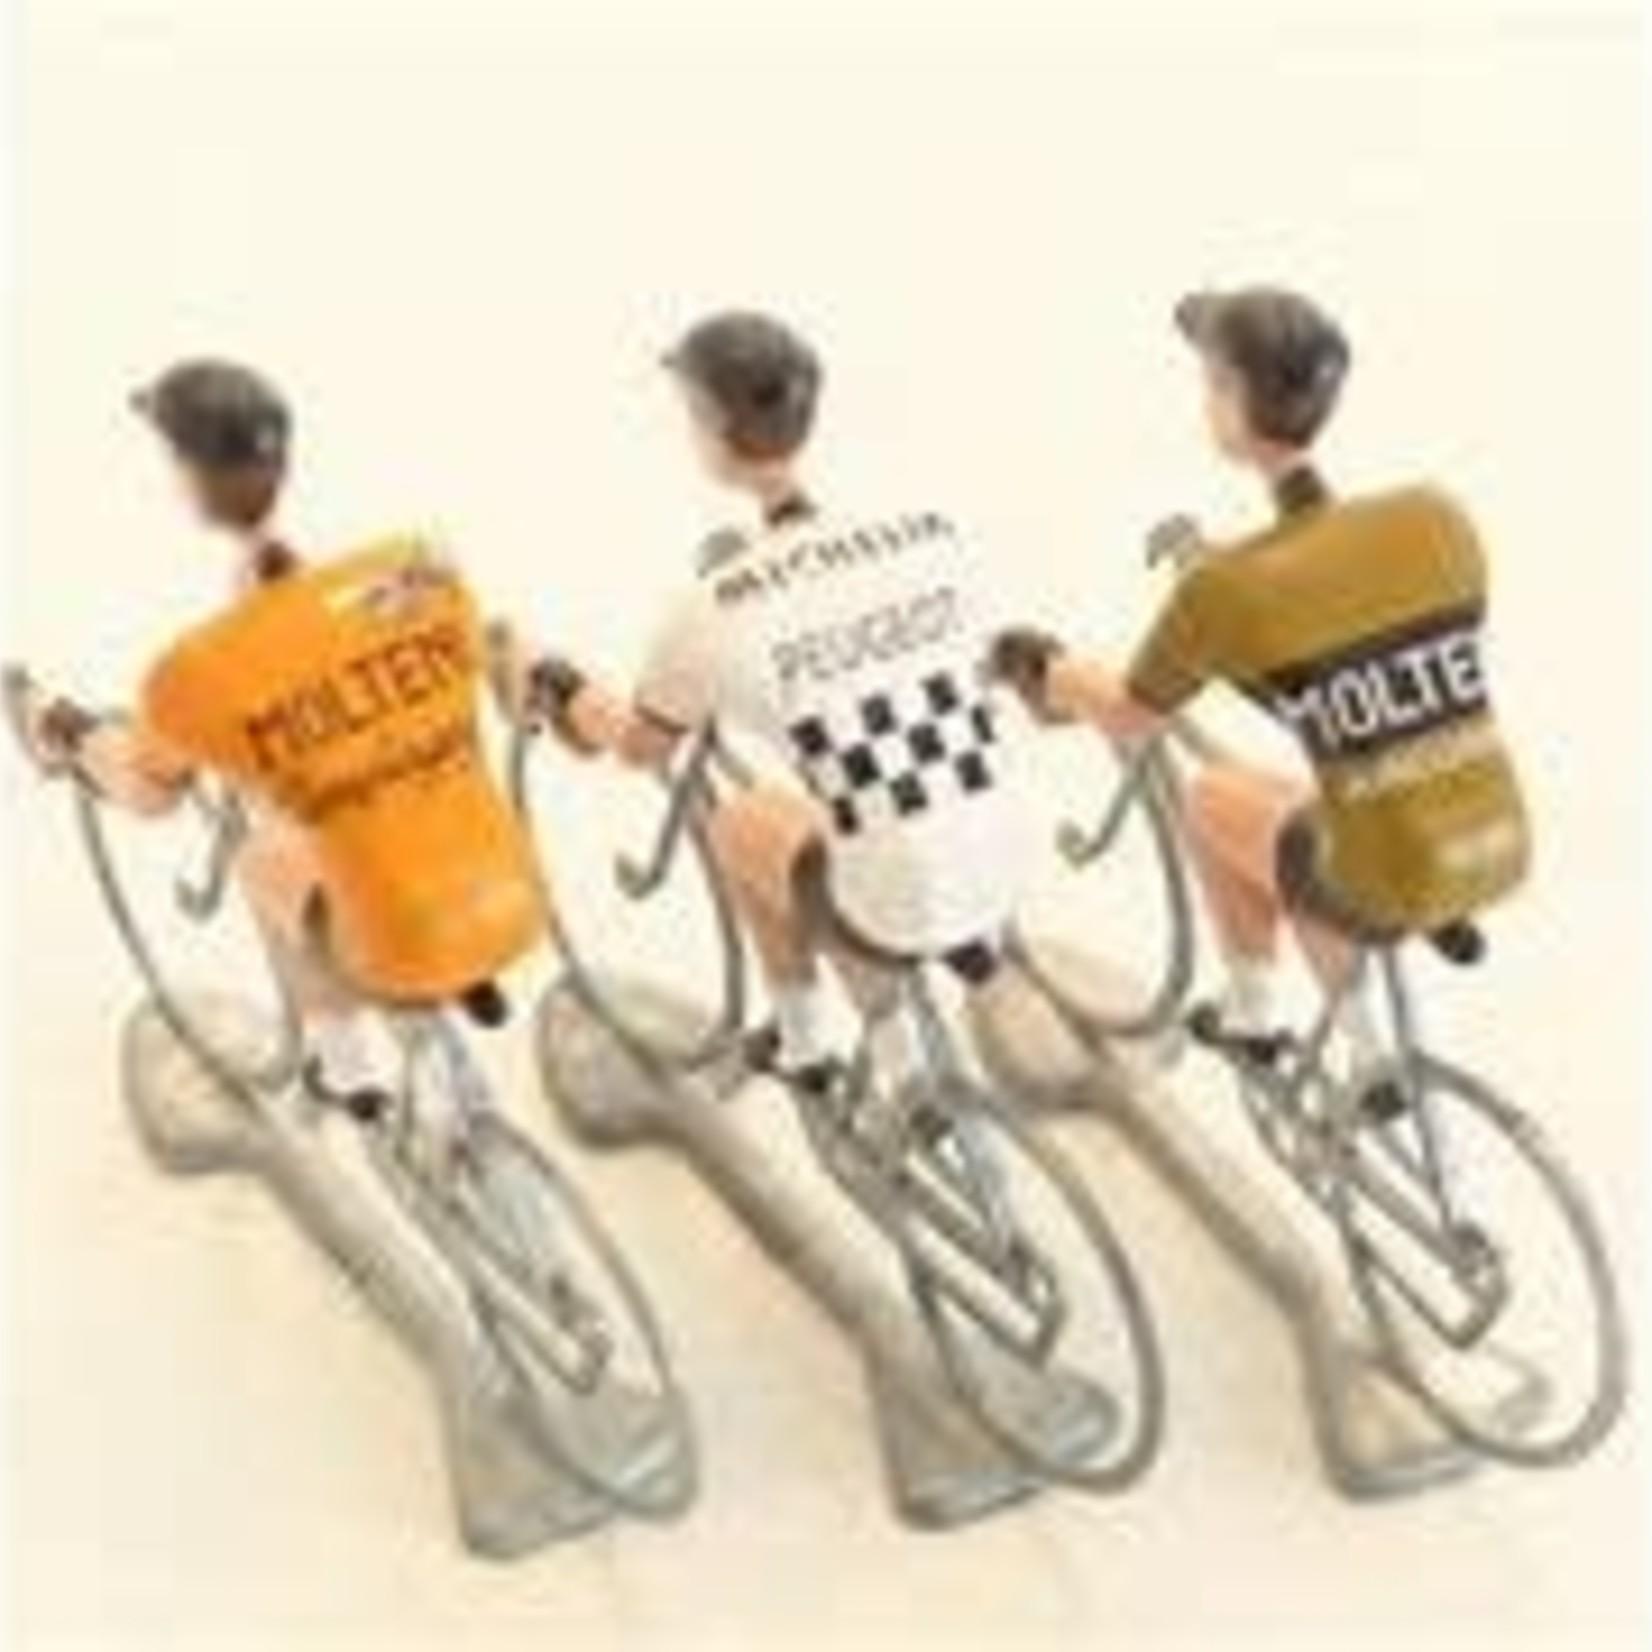 Miniatuur Cycling hero 2 'Eddy Merckx'